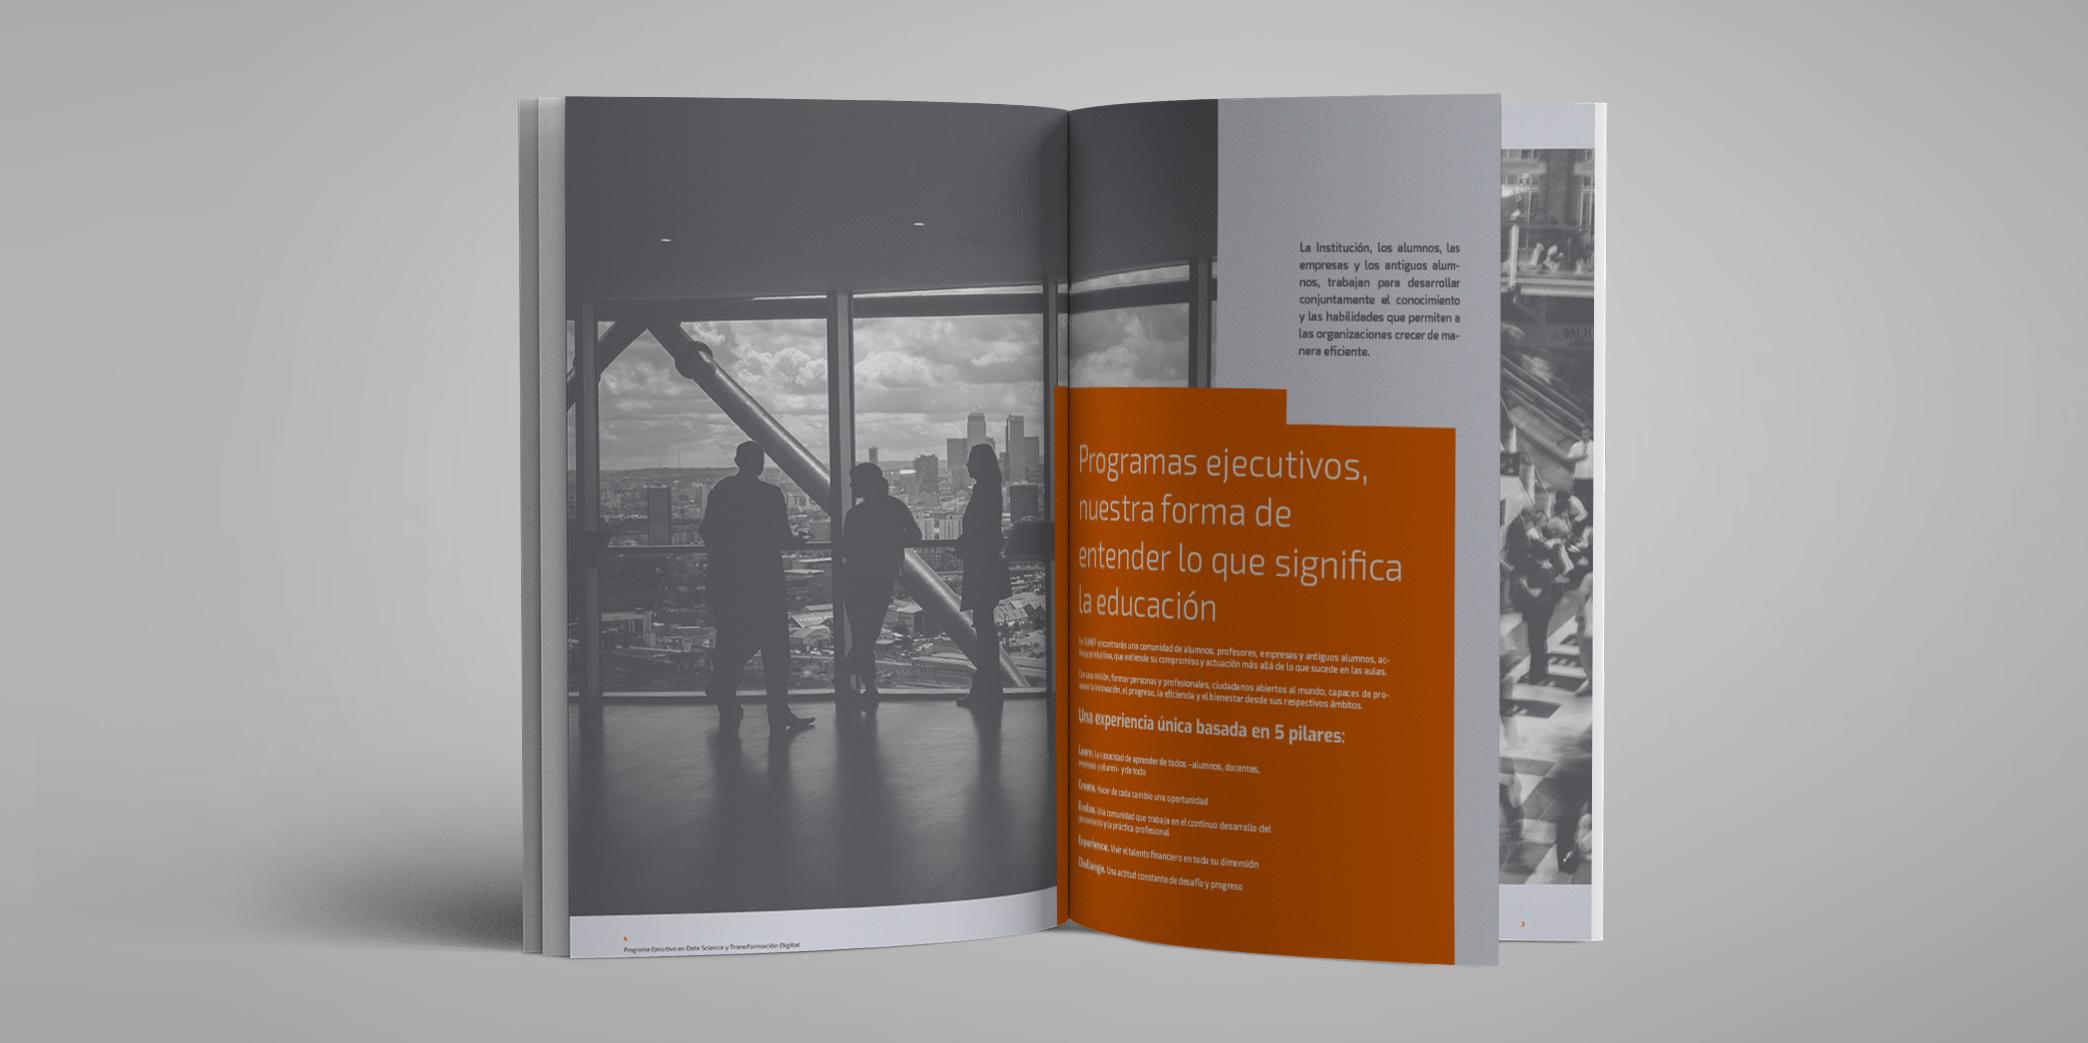 folletos cunef 3.jpg